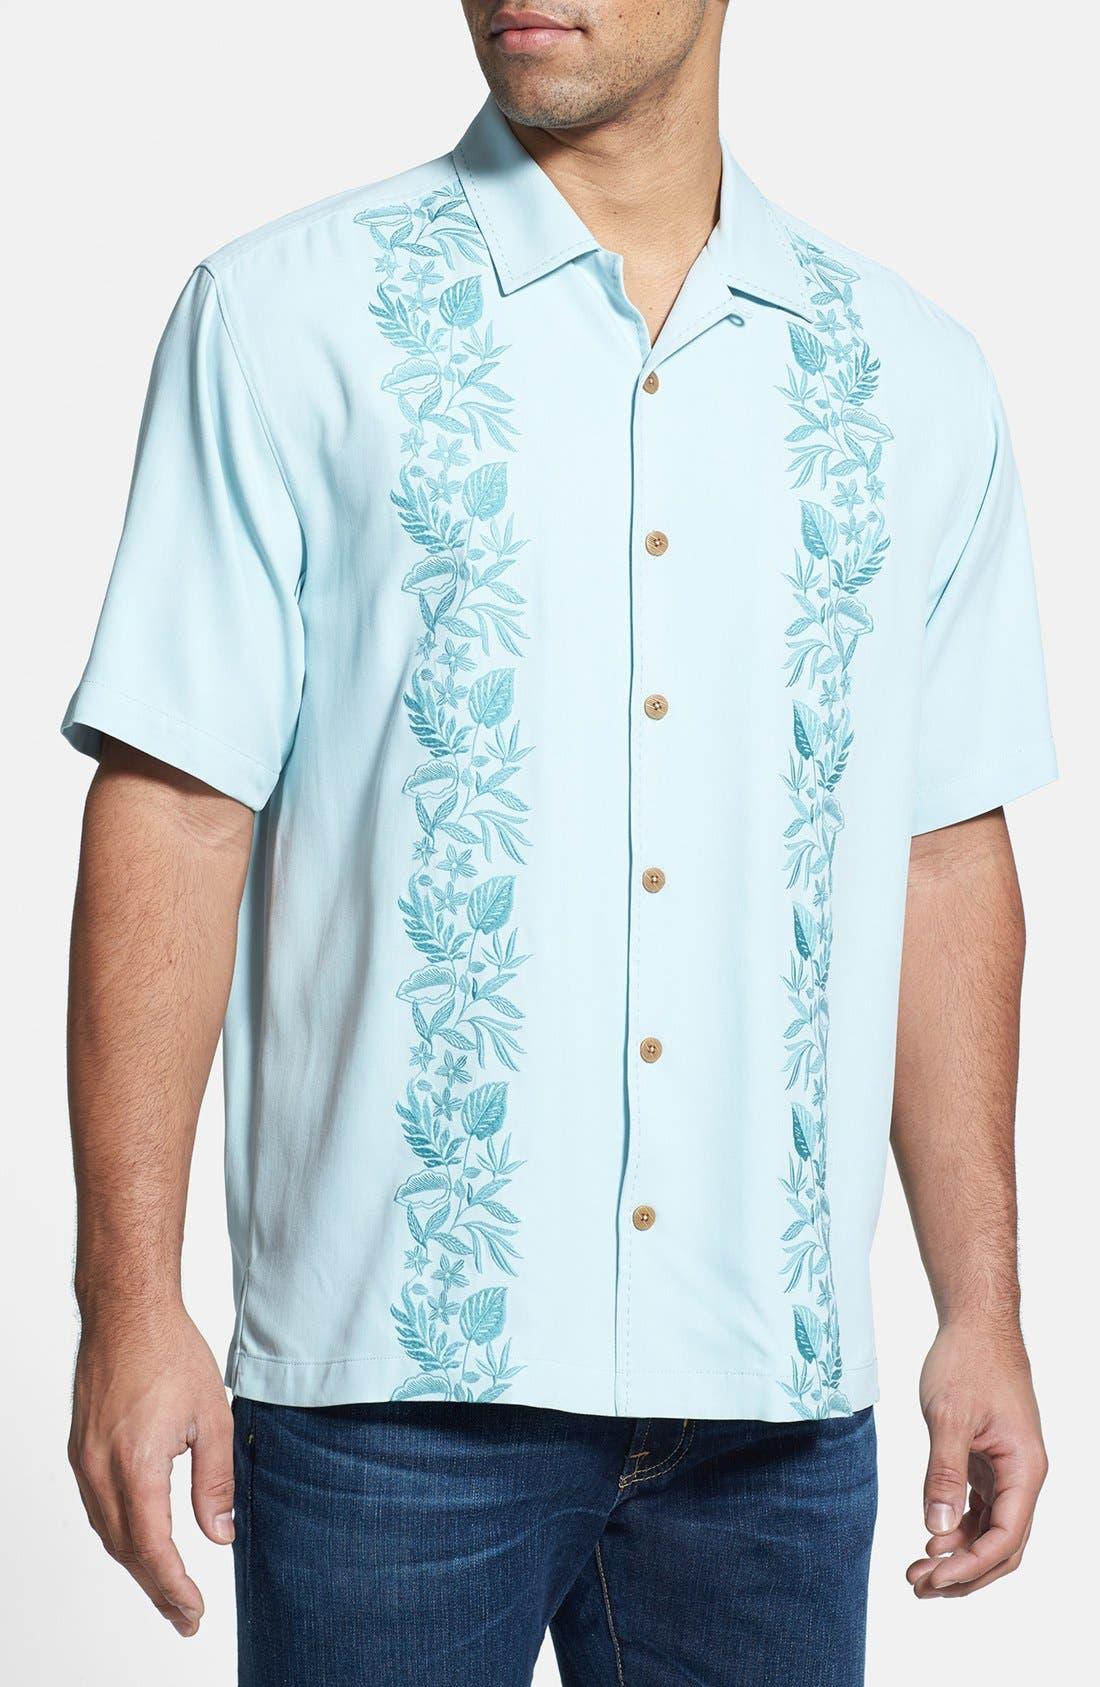 Alternate Image 1 Selected - Tommy Bahama 'Road to Havana' Regular Fit Silk Campshirt (Big & Tall)